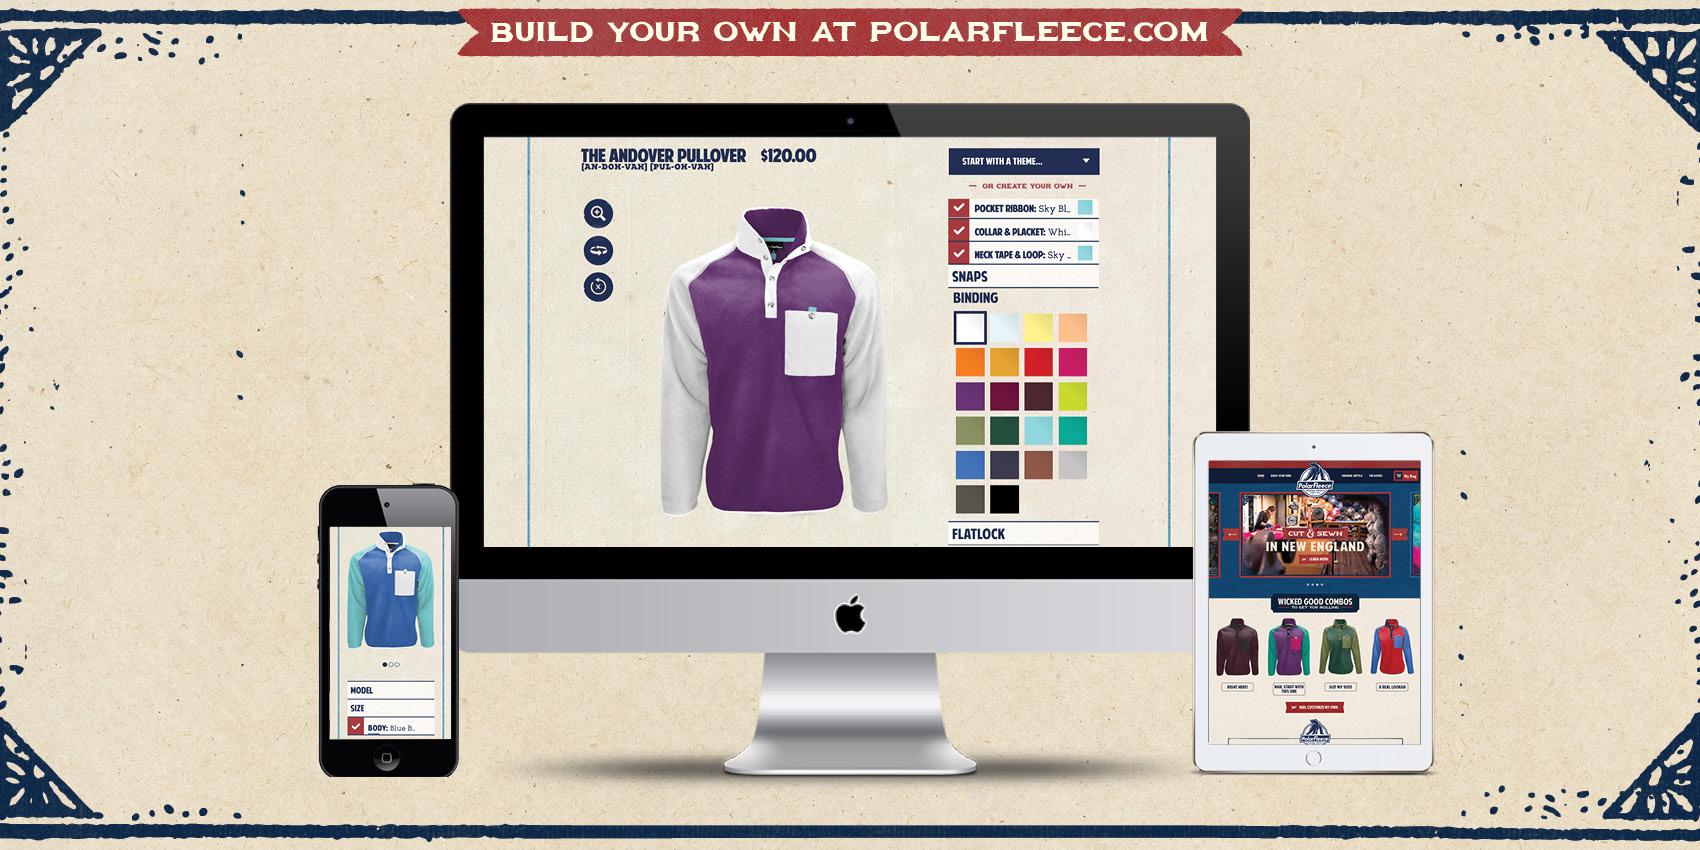 POLR-0306_Polarfleece_BrandDirective_082018_FINAL_lowres17.jpg